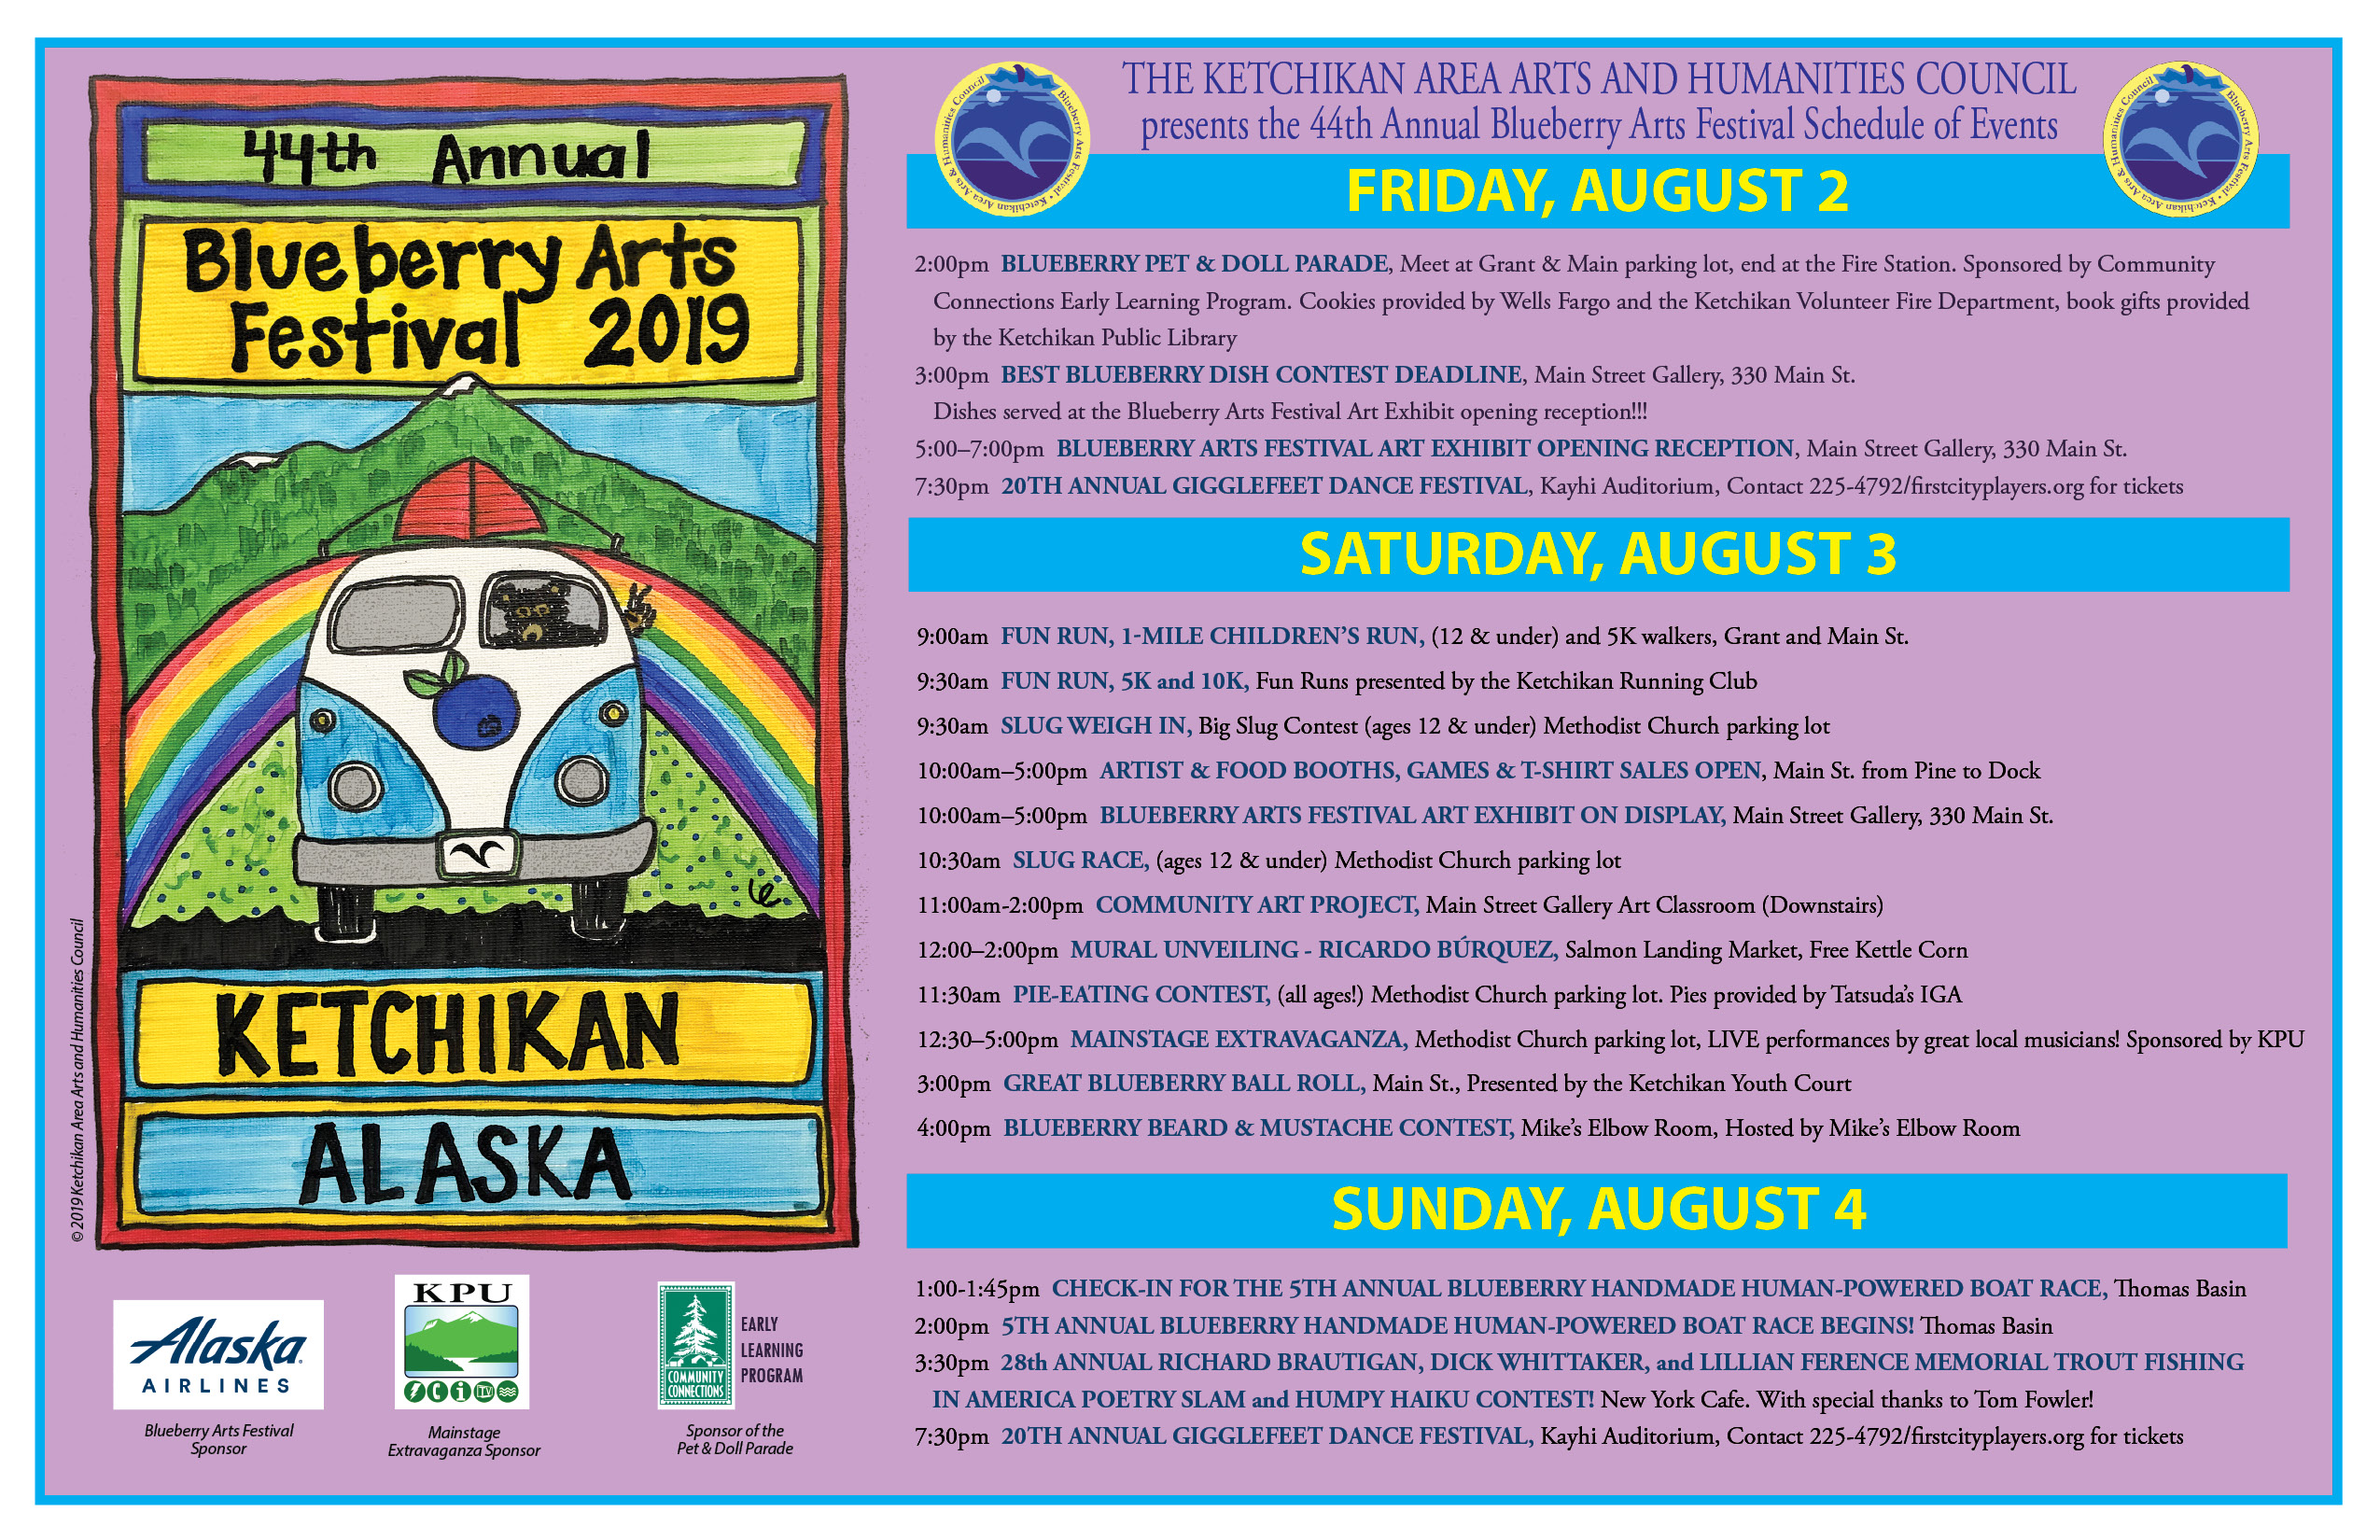 Blueberry Arts Festival Schedule